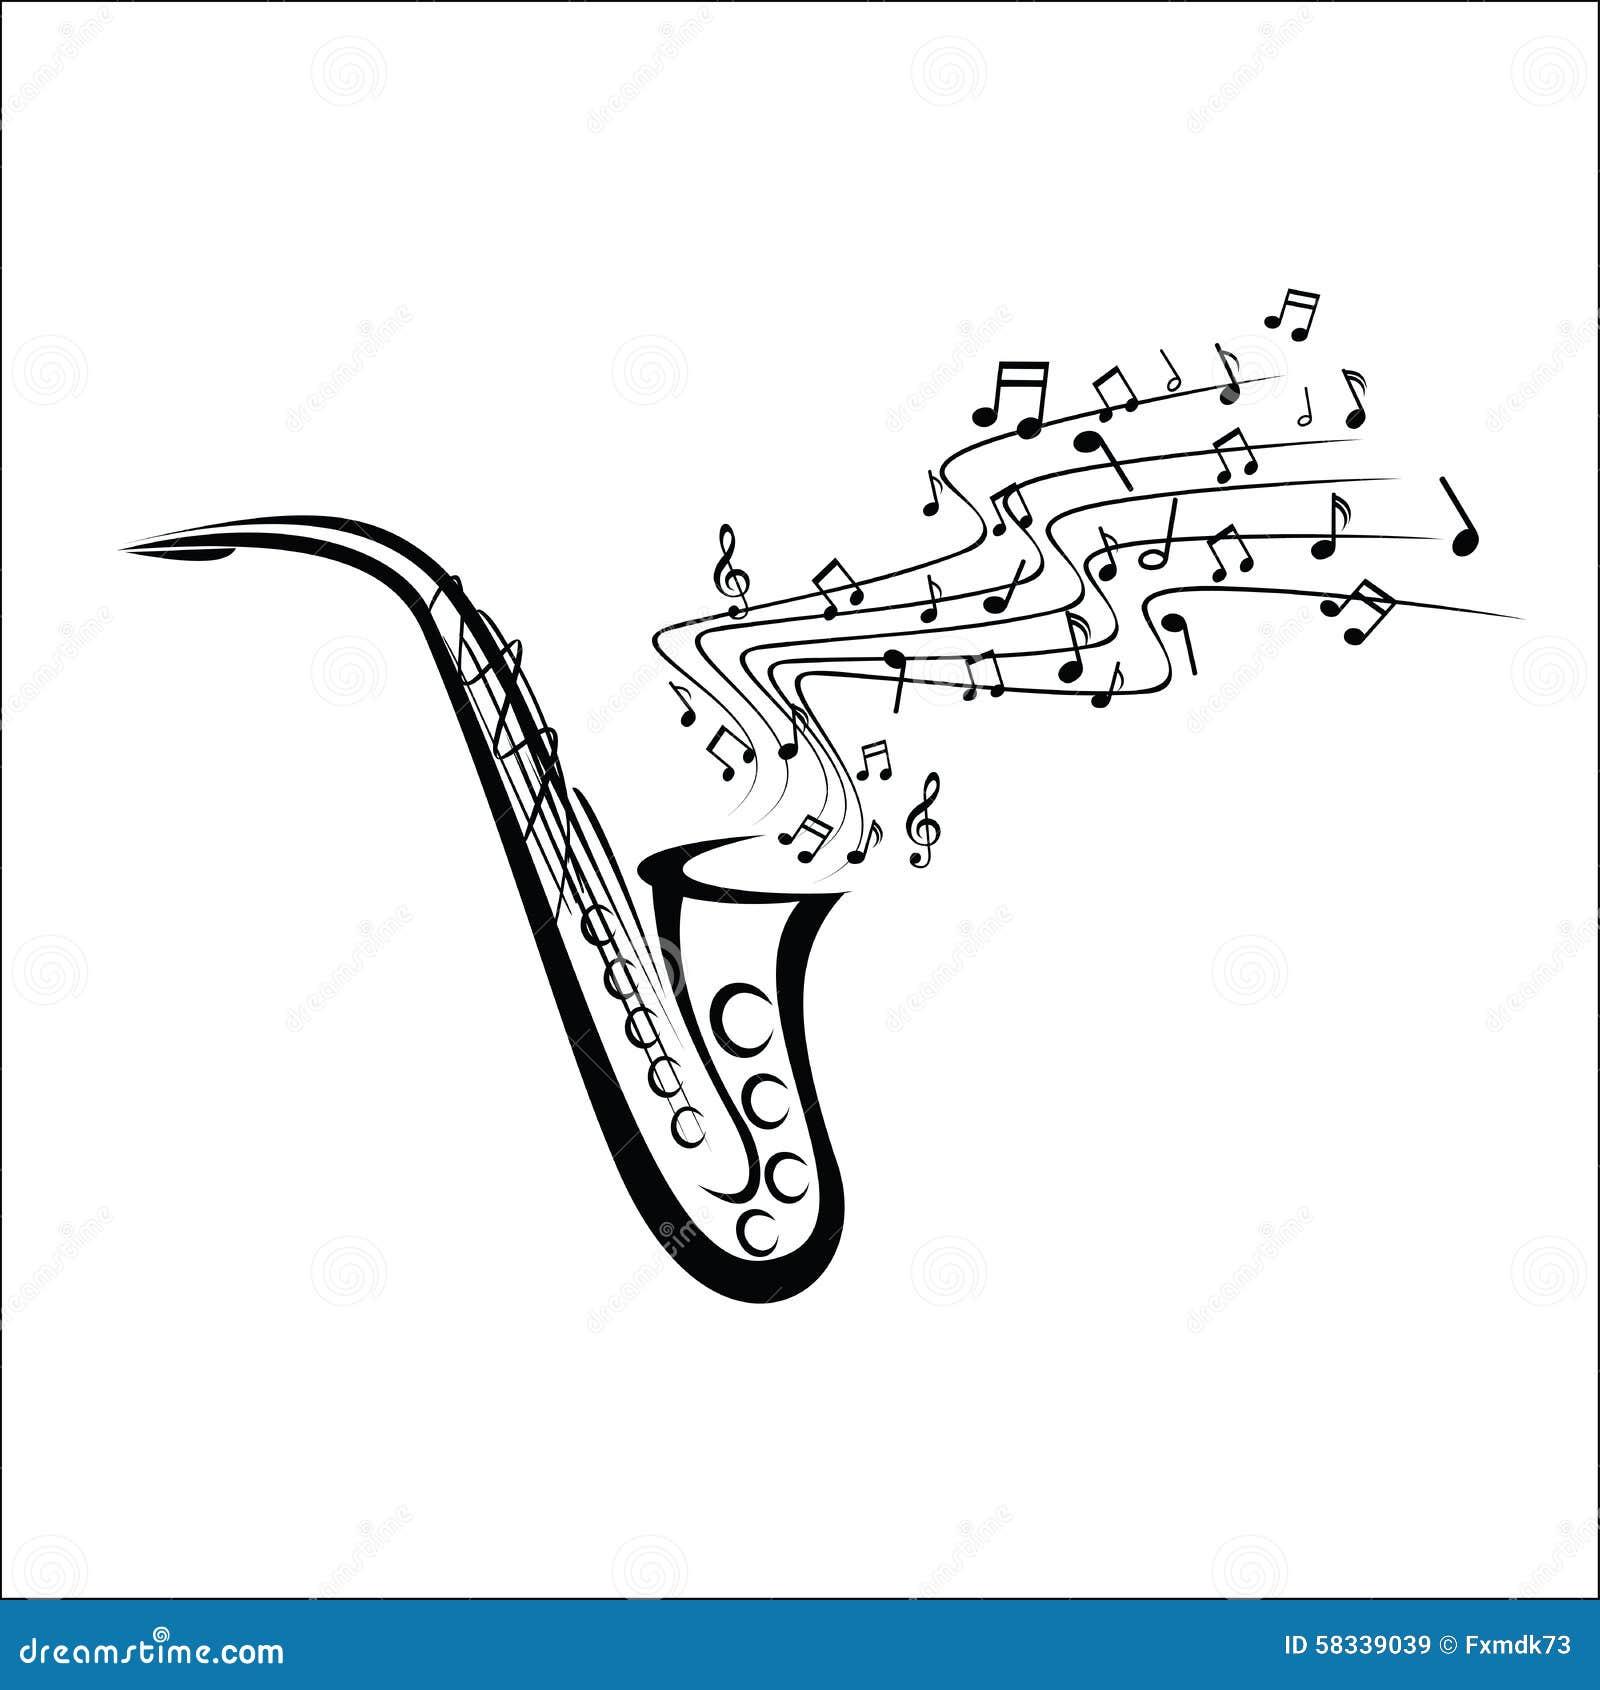 Saxophone sketch stock vector illustration of brass - Saxophone dessin ...